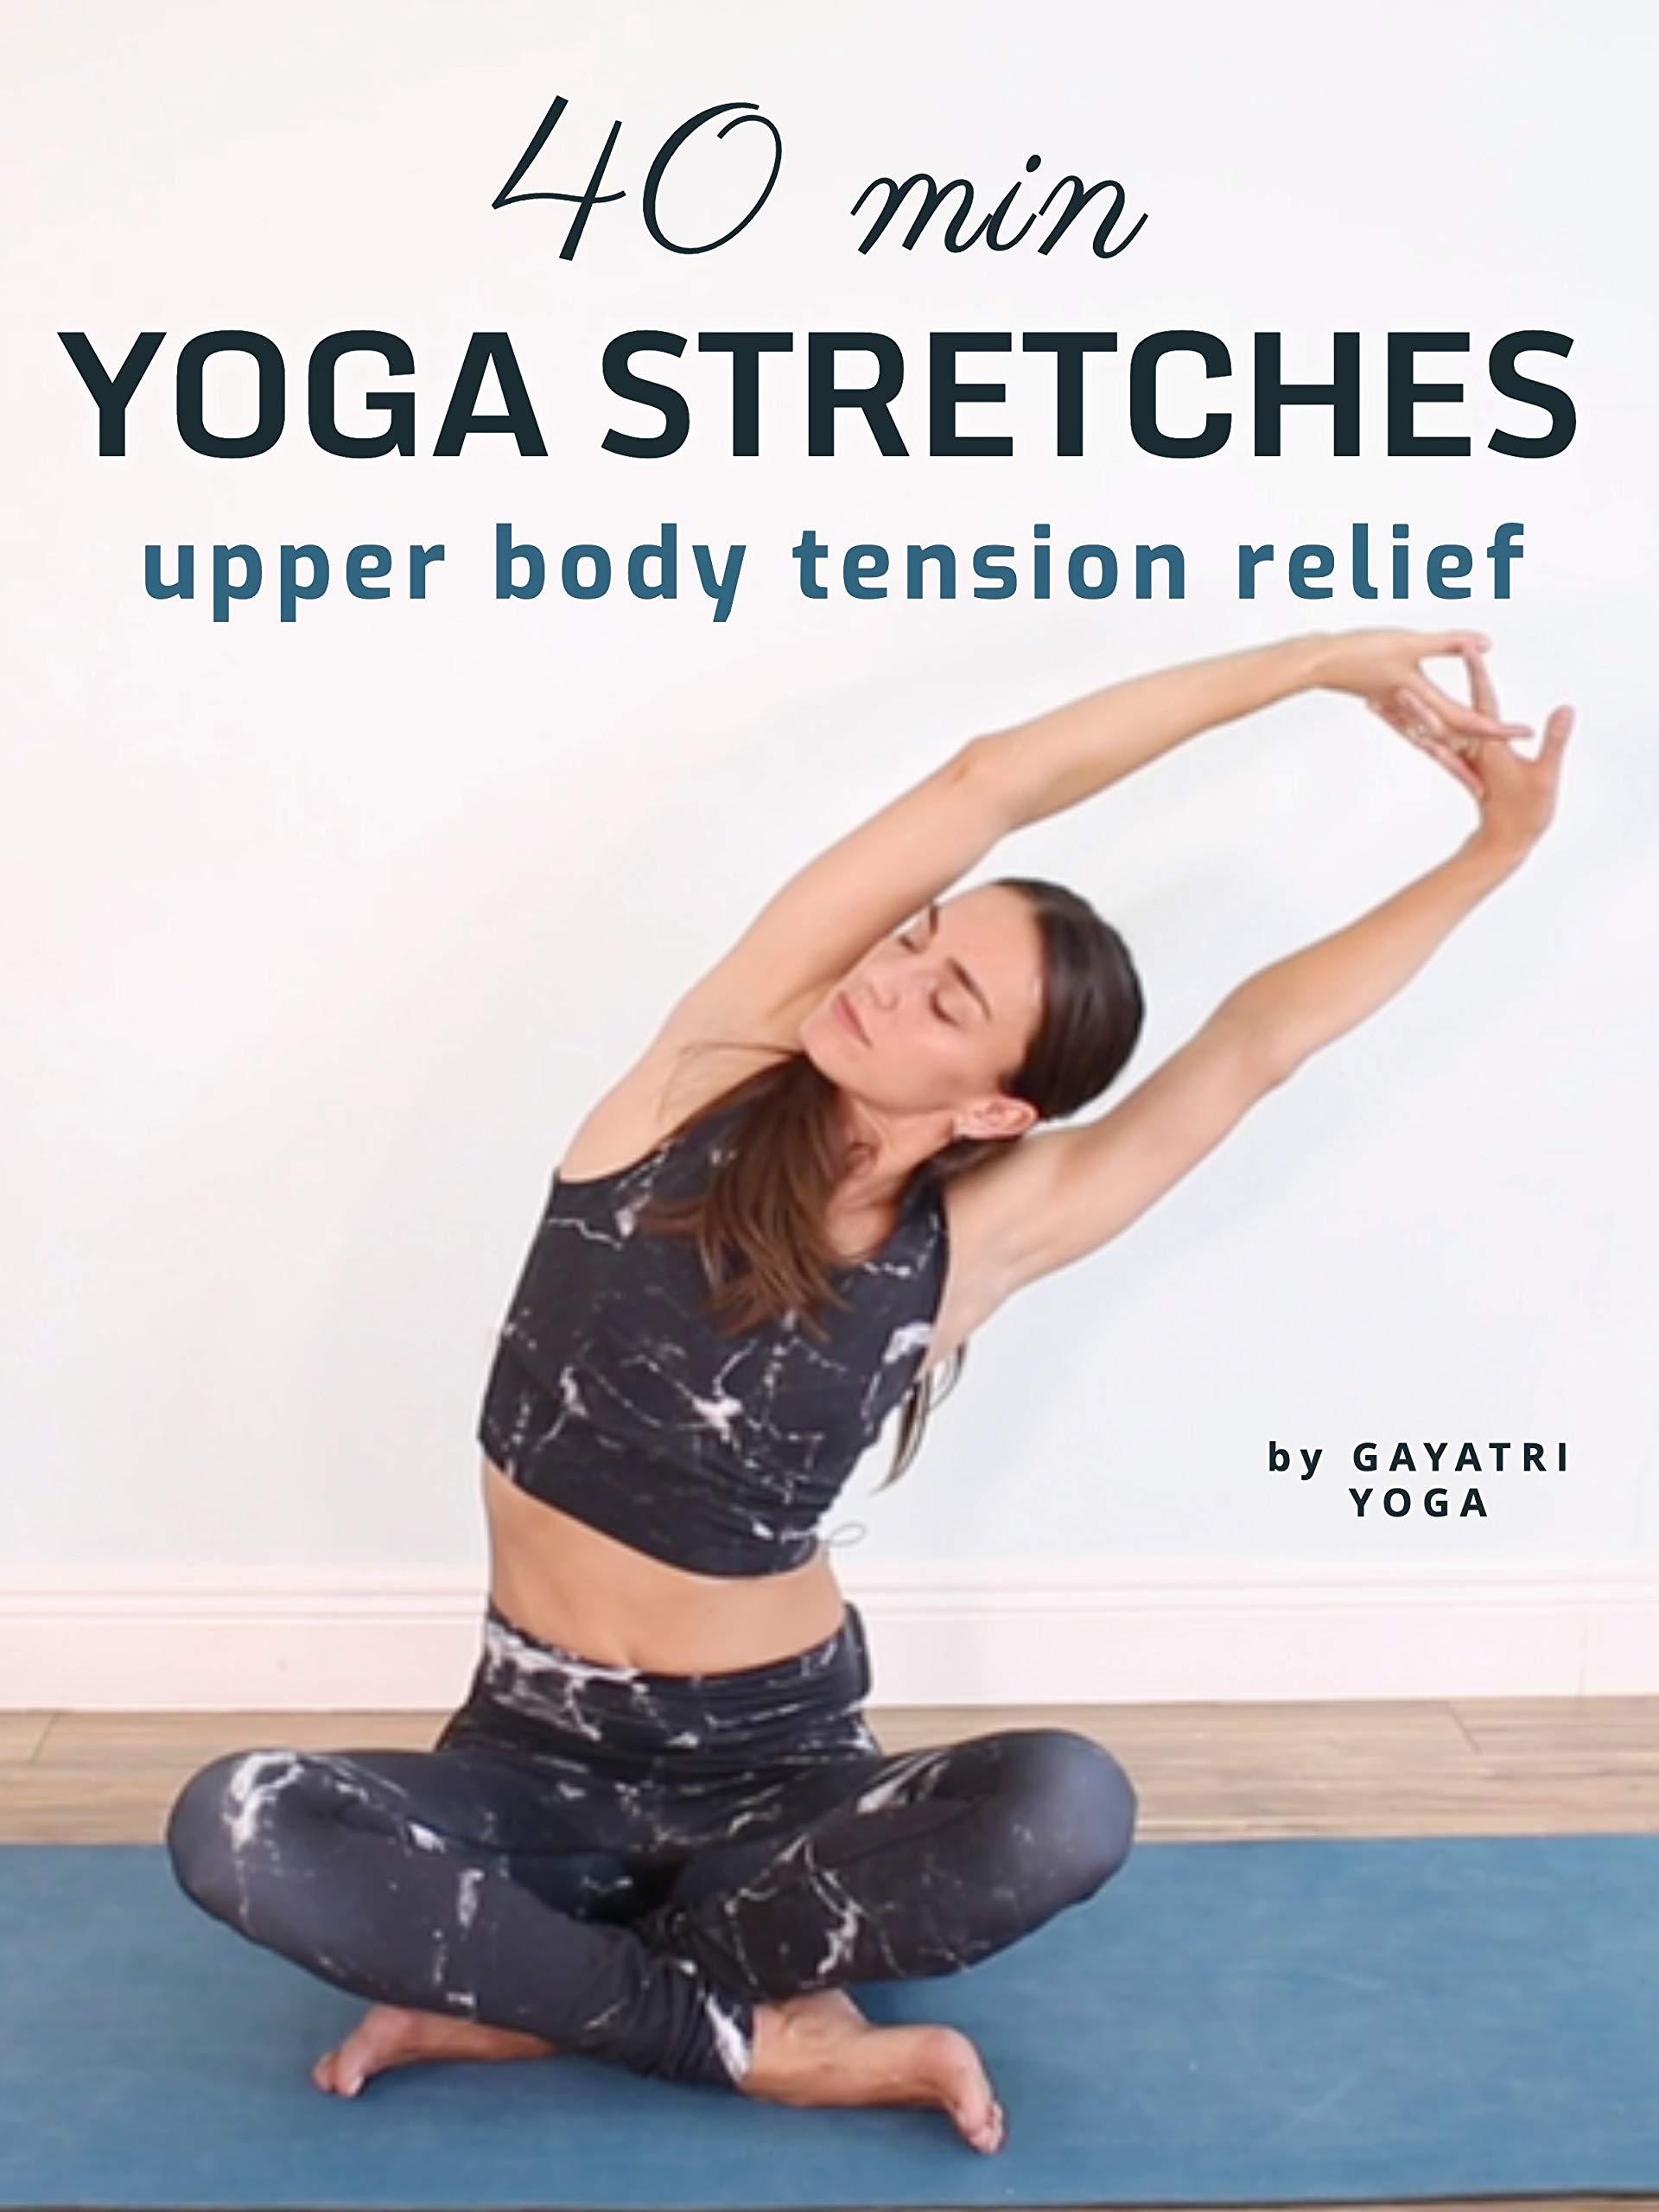 40 Min Yoga Stretches - Upper Body Tension Relief